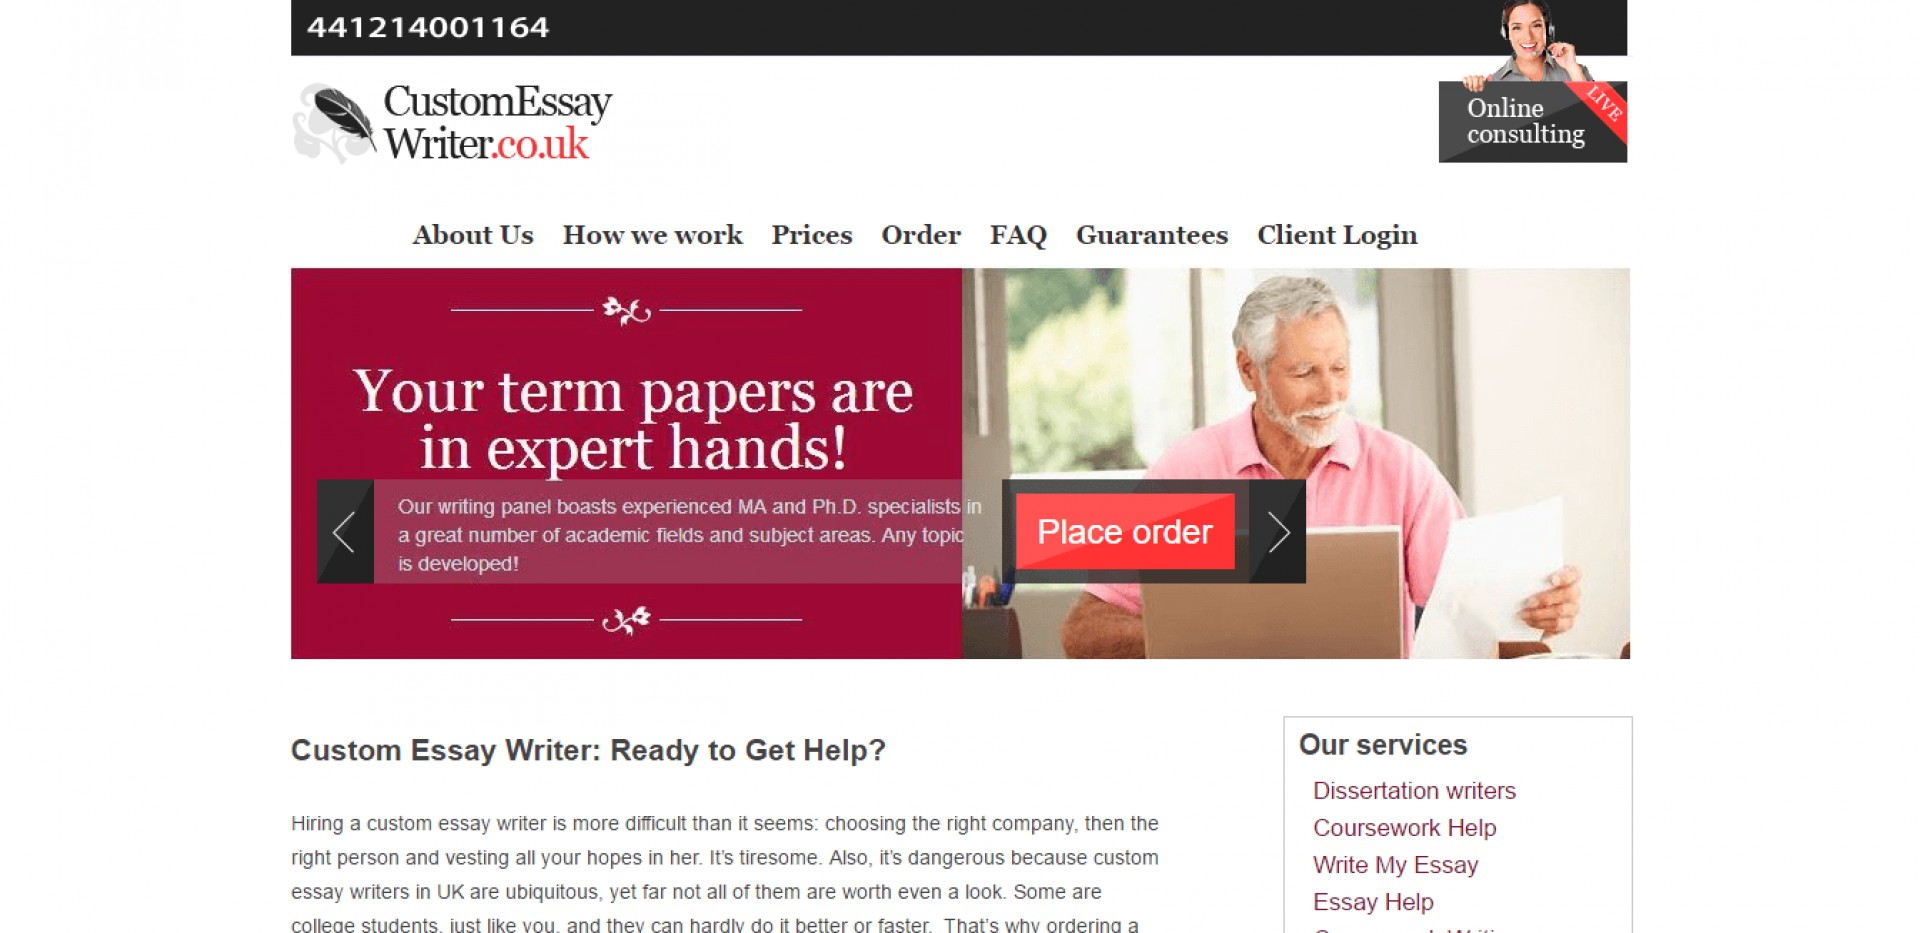 002 Customessaywriter Essay Example Writing Companies Top Uk Websites Sites 1920